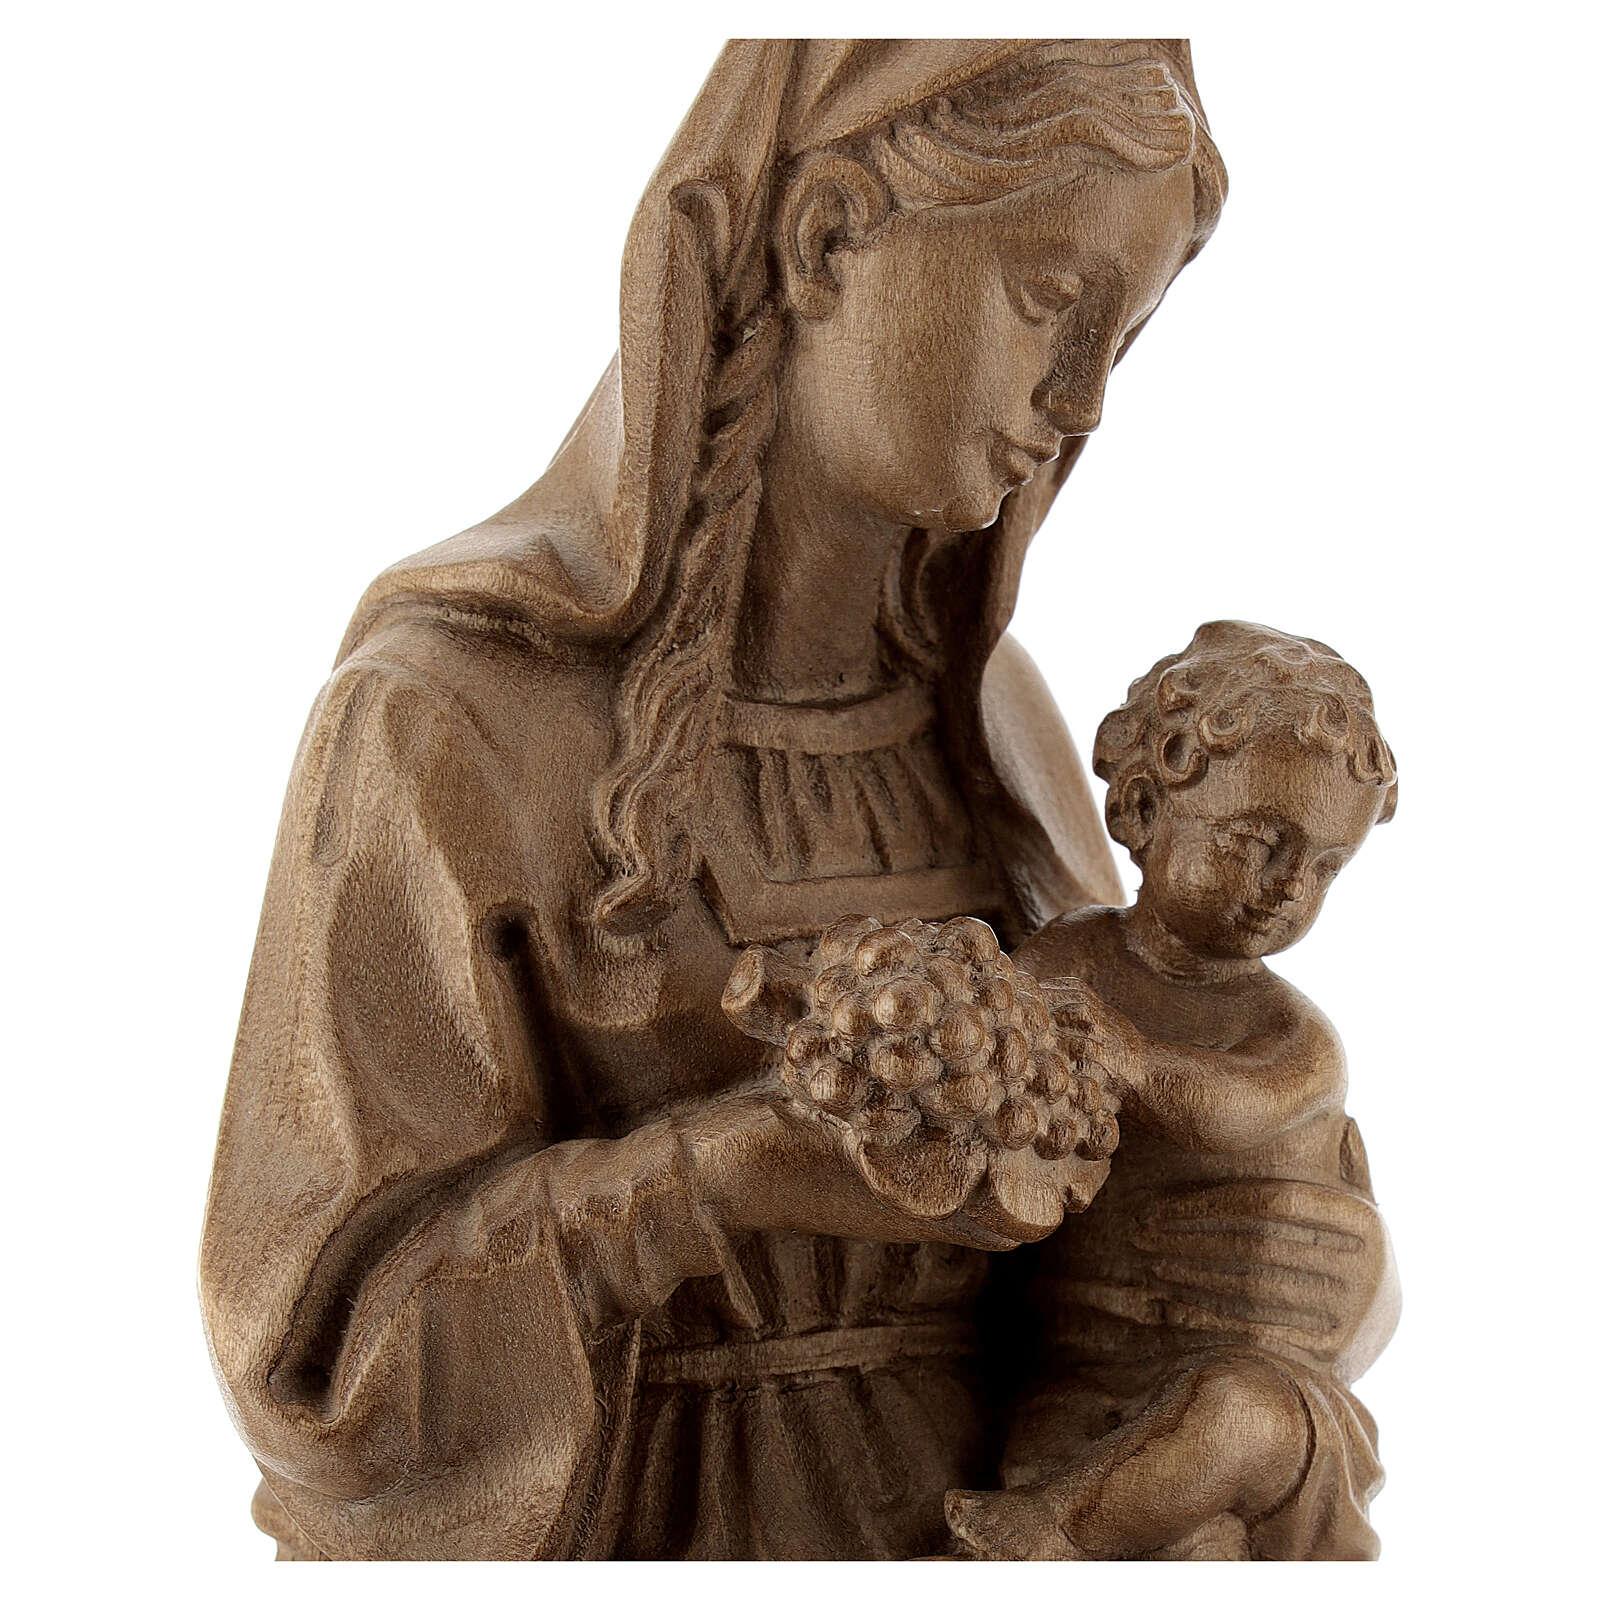 Madonna seduta con bimbo e uva legno Valgardena patinato 4